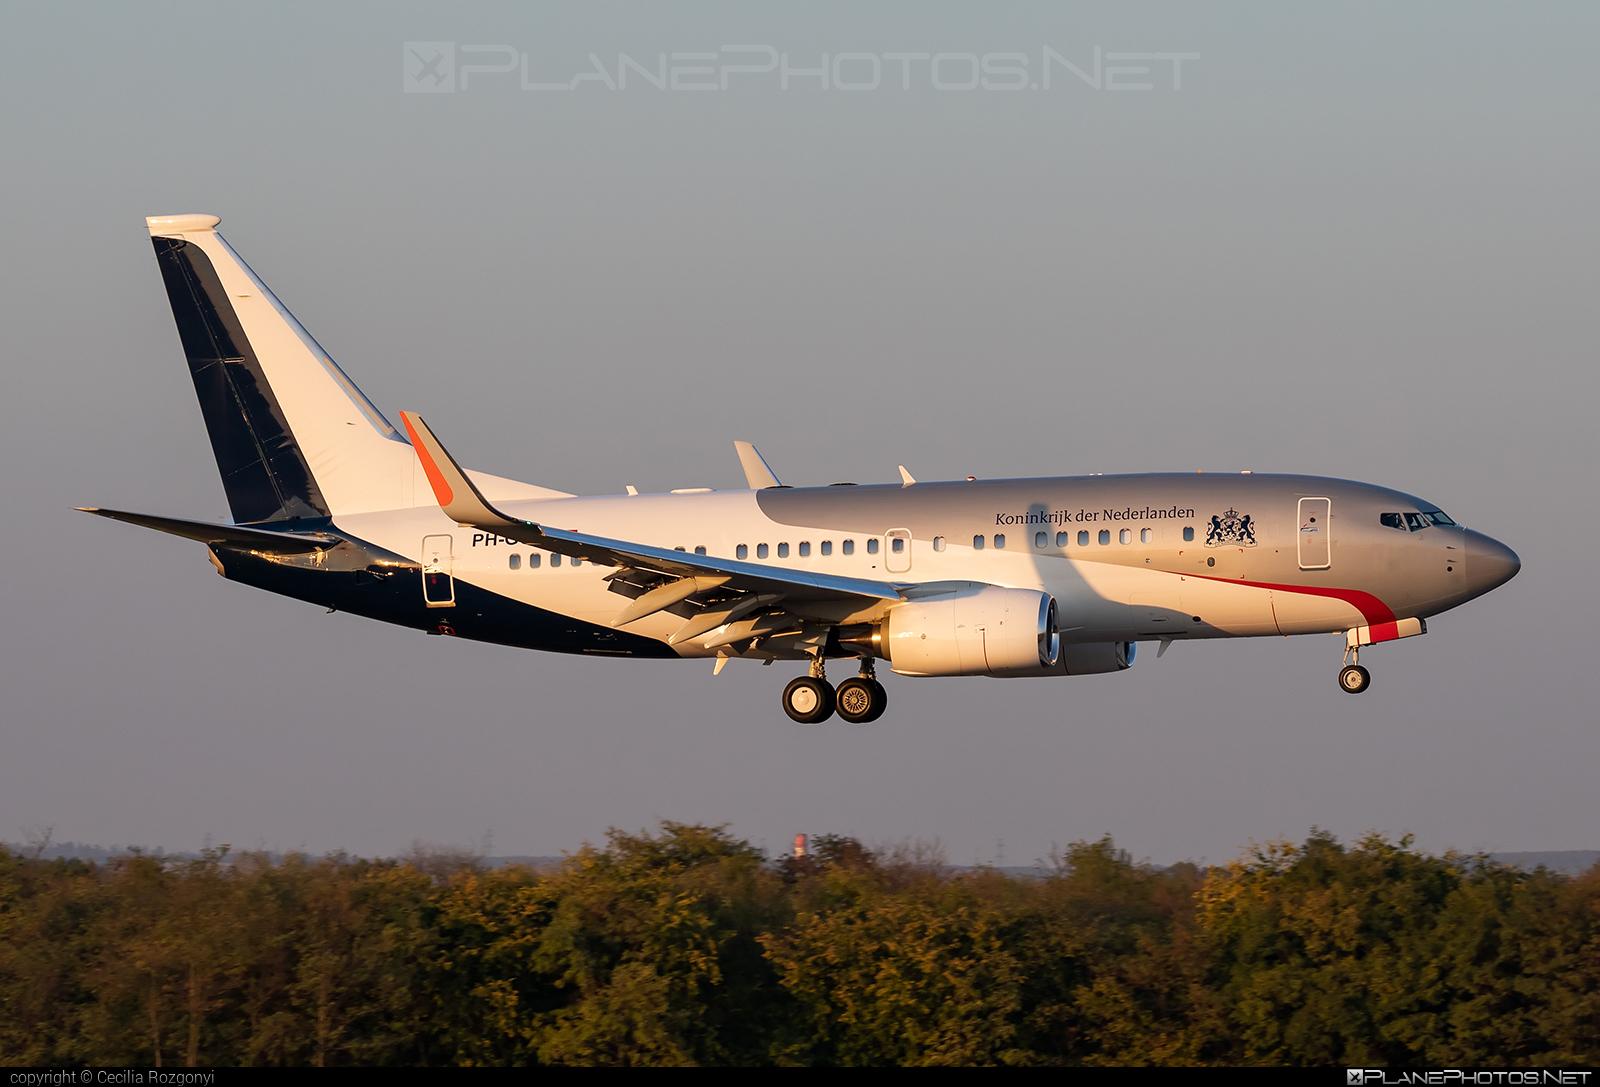 Boeing 737-700 BBJ - PH-GOV operated by Netherlands - Government #b737 #b737bbj #bbj #boeing #boeing737 #boeingbusinessjet